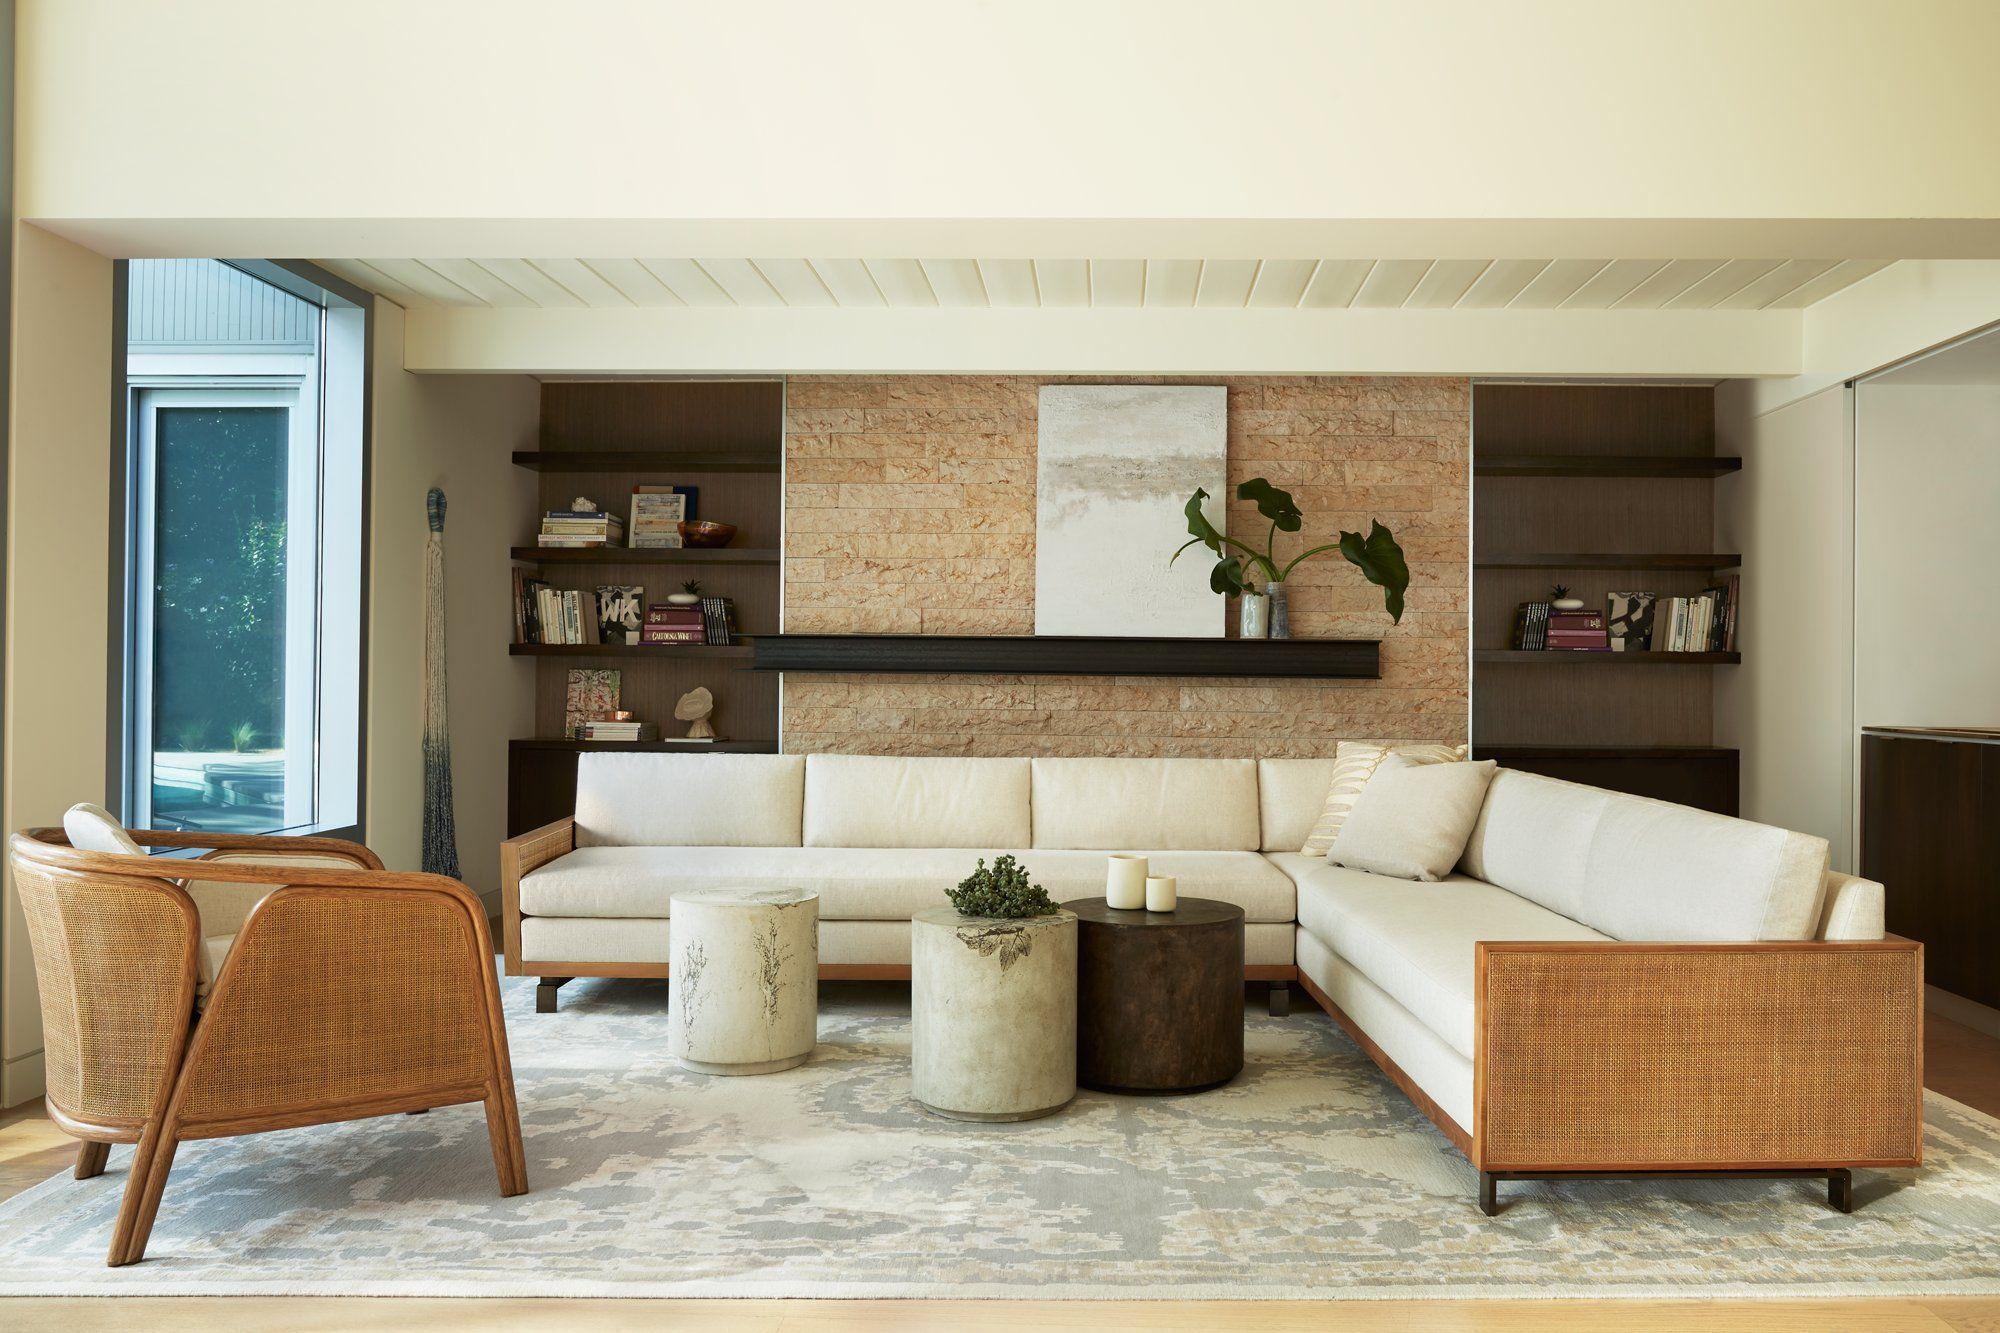 The Barbara Barry Collection interior